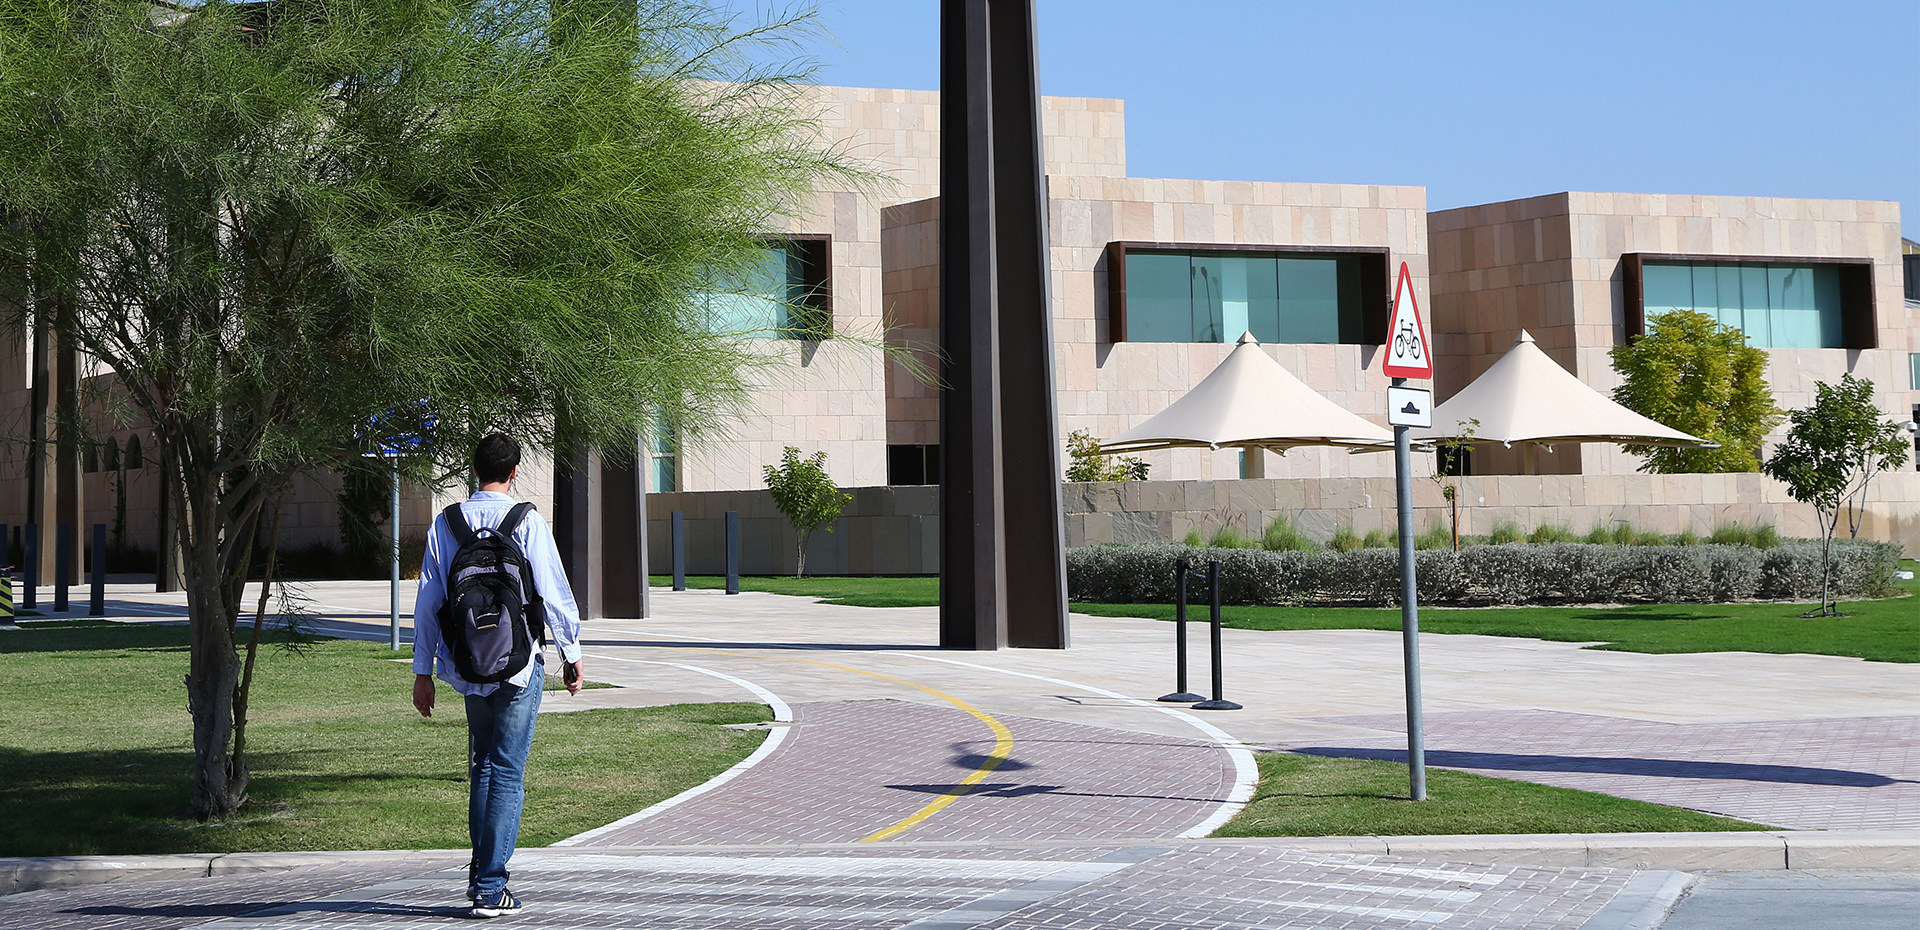 HBKU Student Center